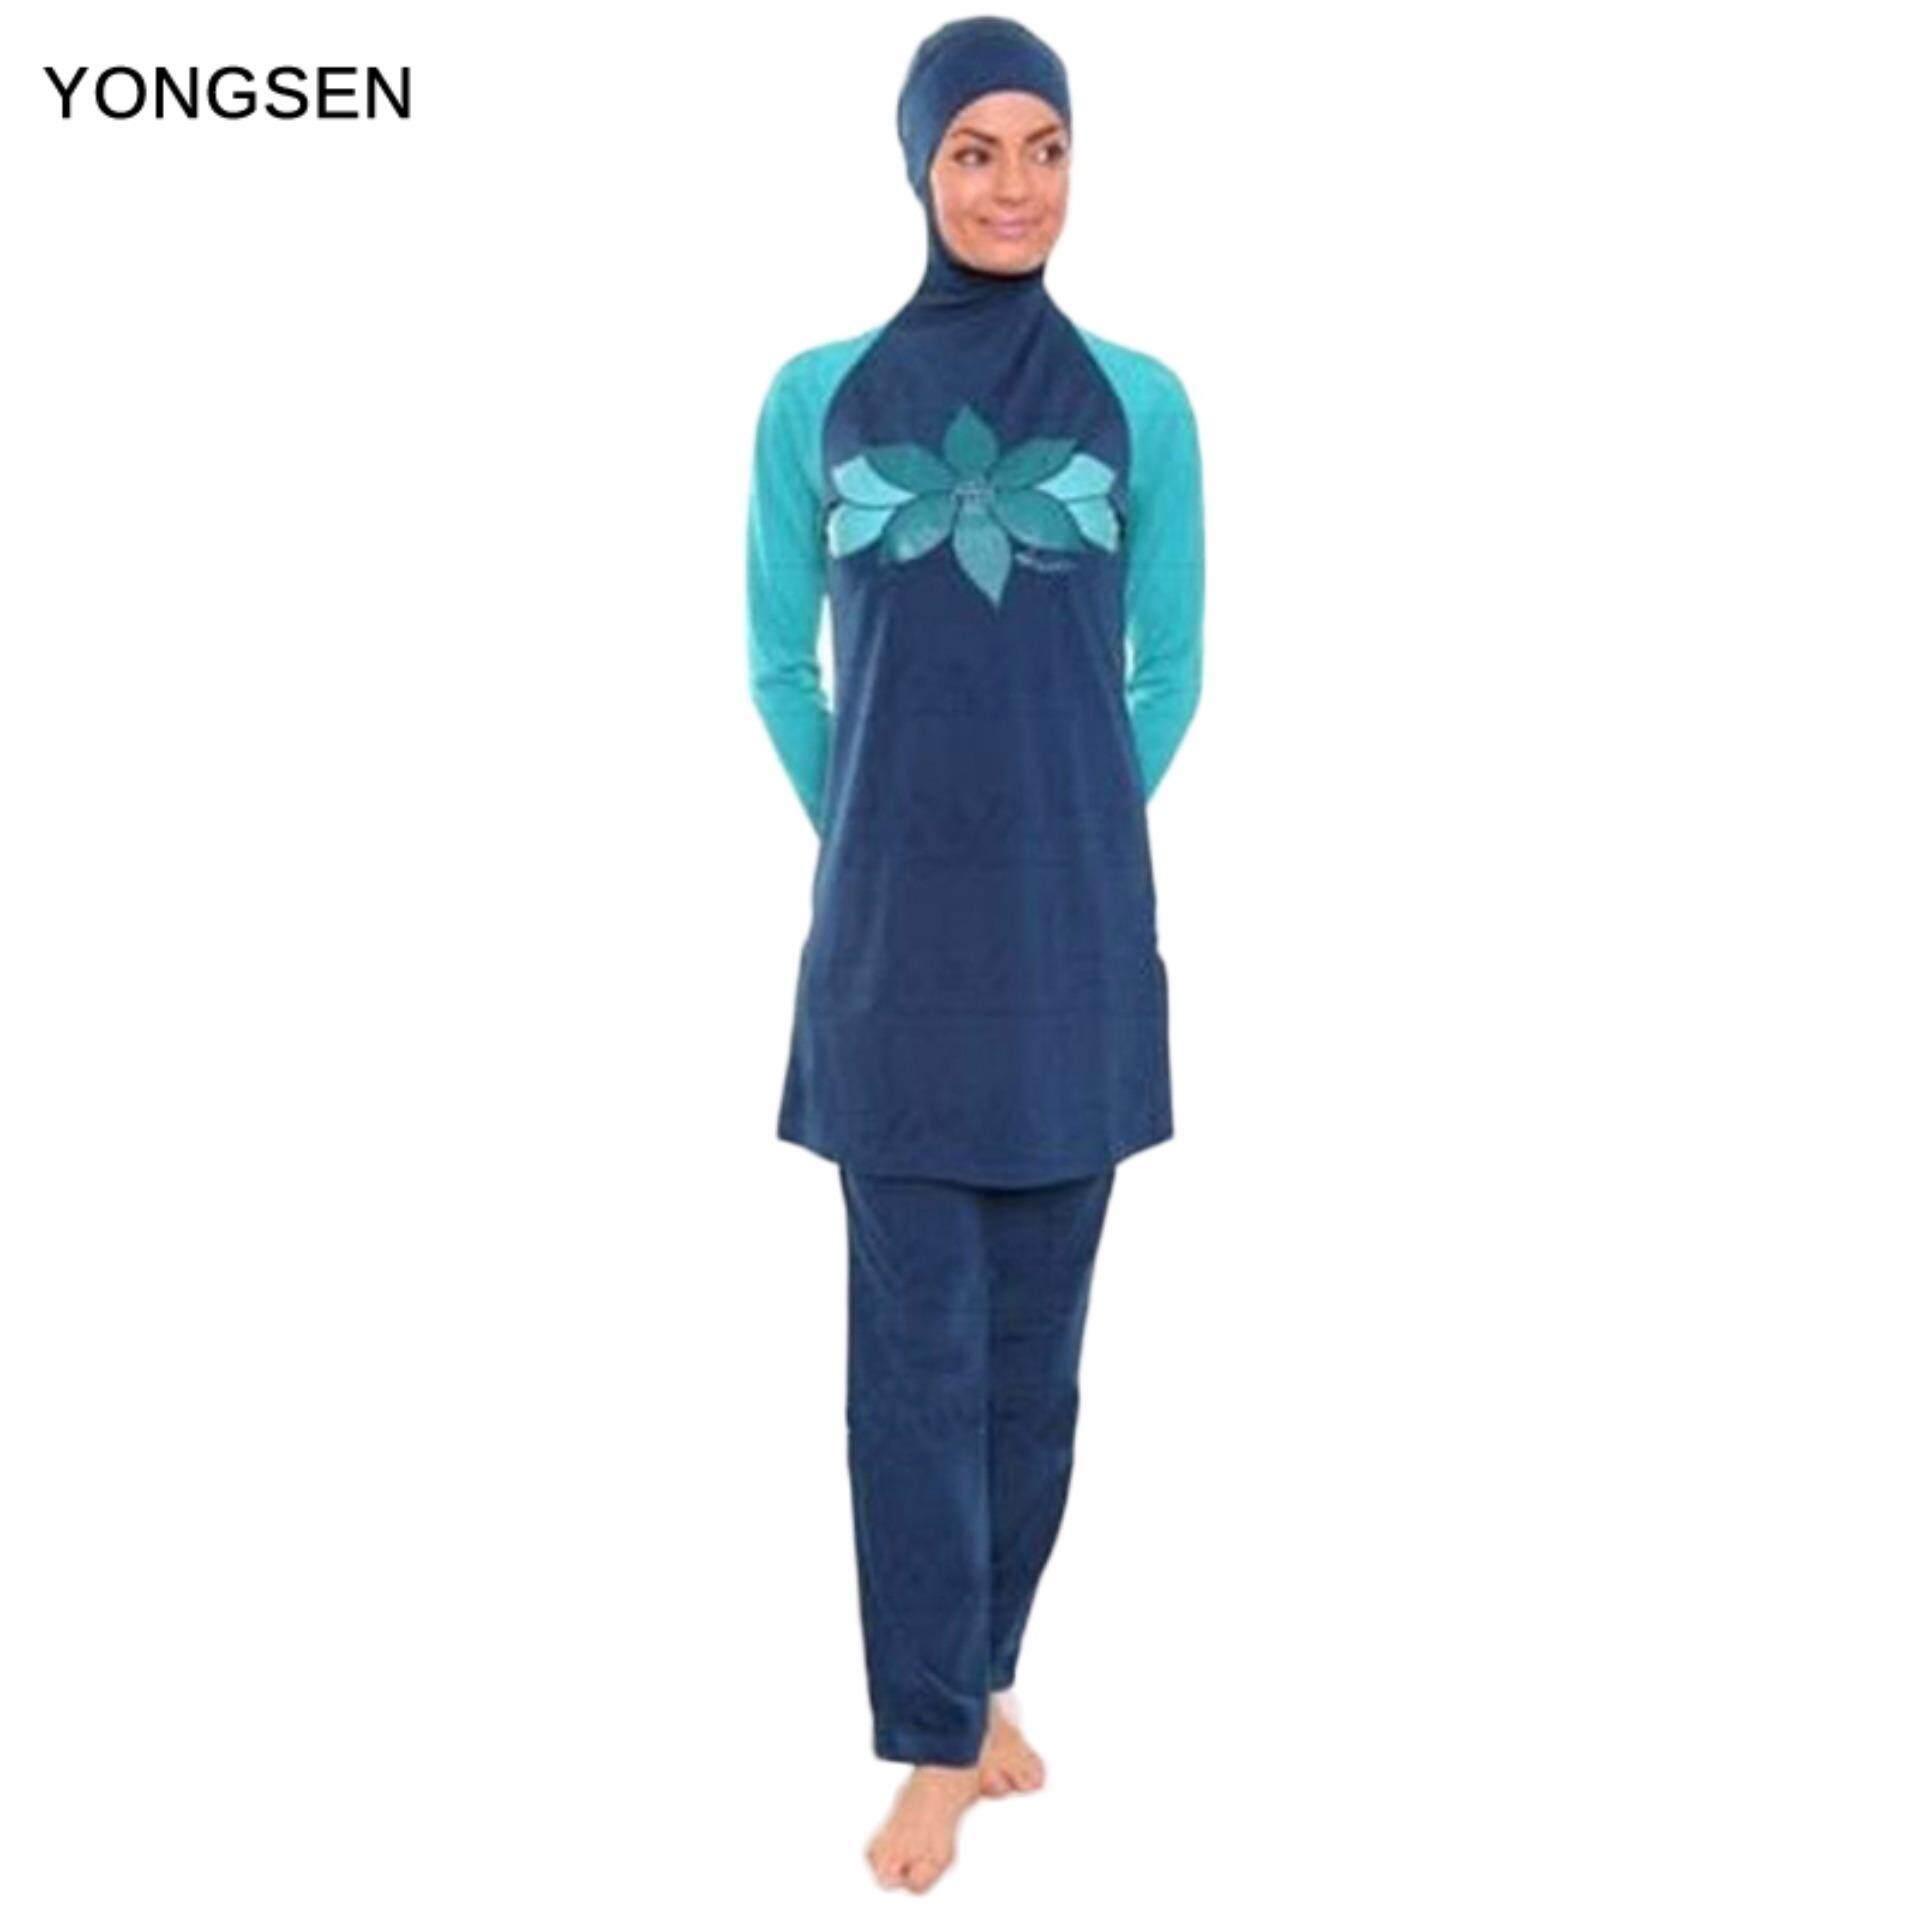 c5767464d YONGSEN Muslim Swimwear Islamic Women Modest Hijab Plus Size Burkinis Wear  Swimming Bathing Suit Beach Full